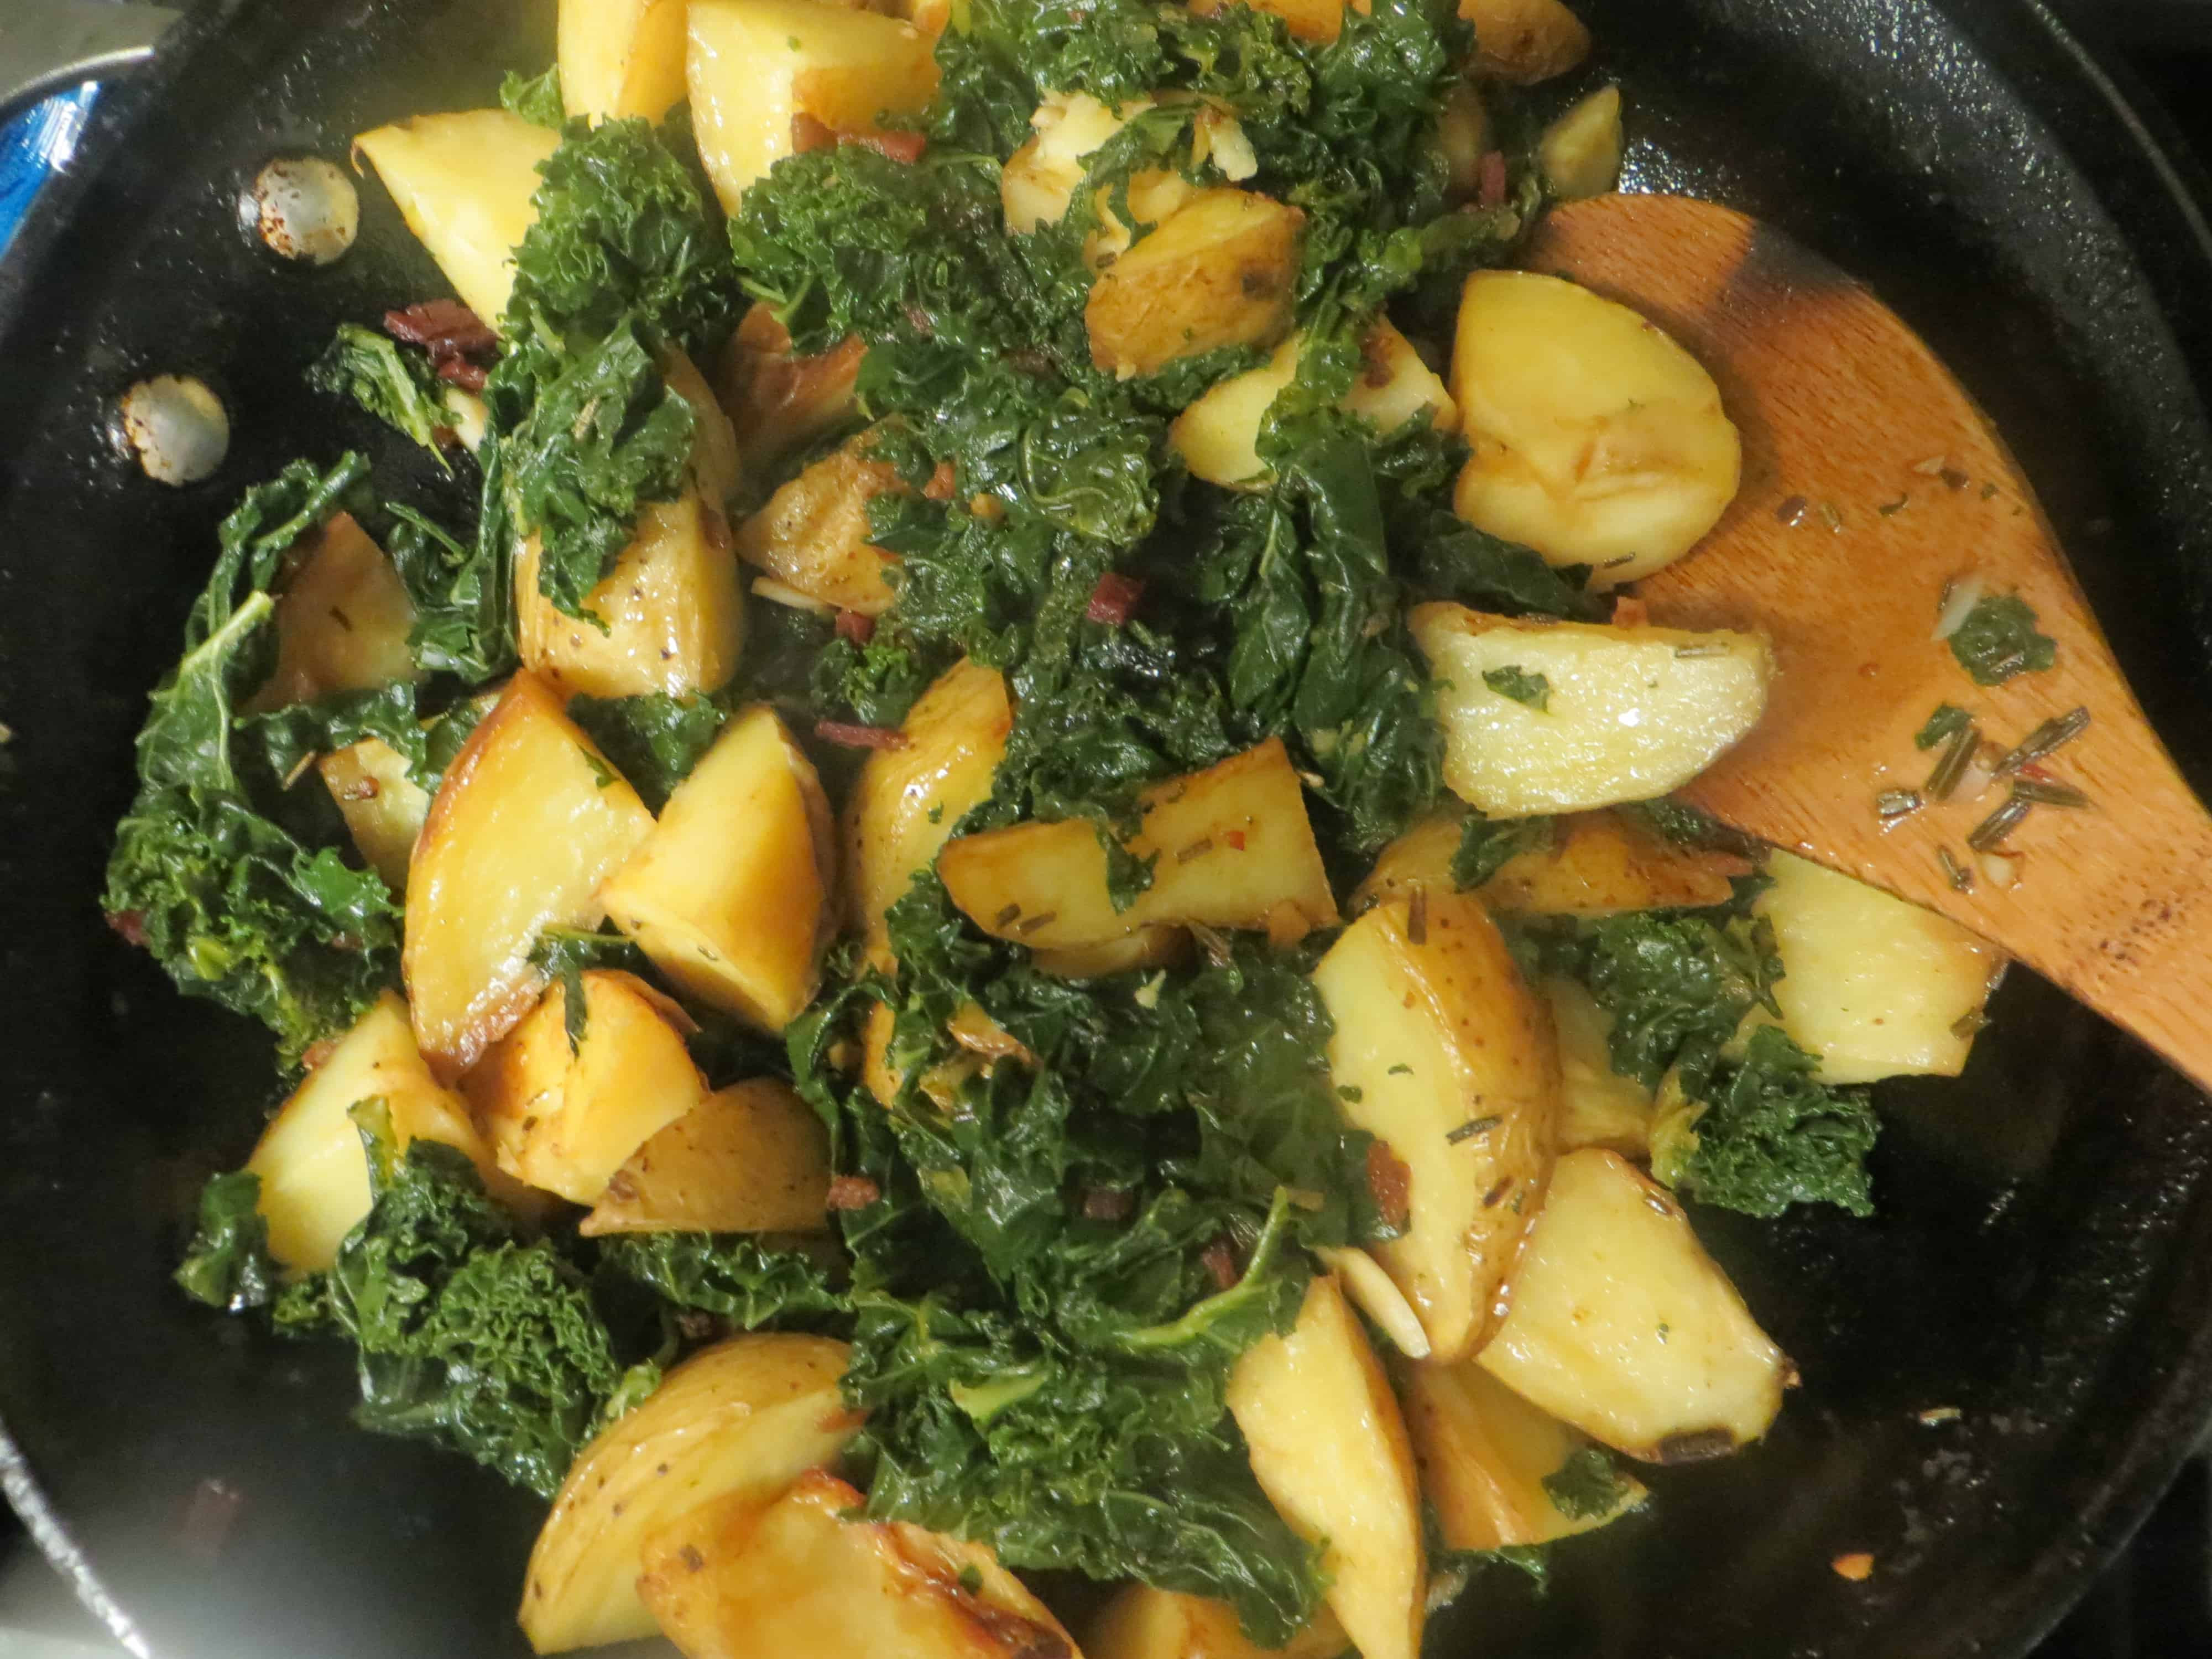 Kale Dinner Recipes  Family friendly kale potato and bacon dinner